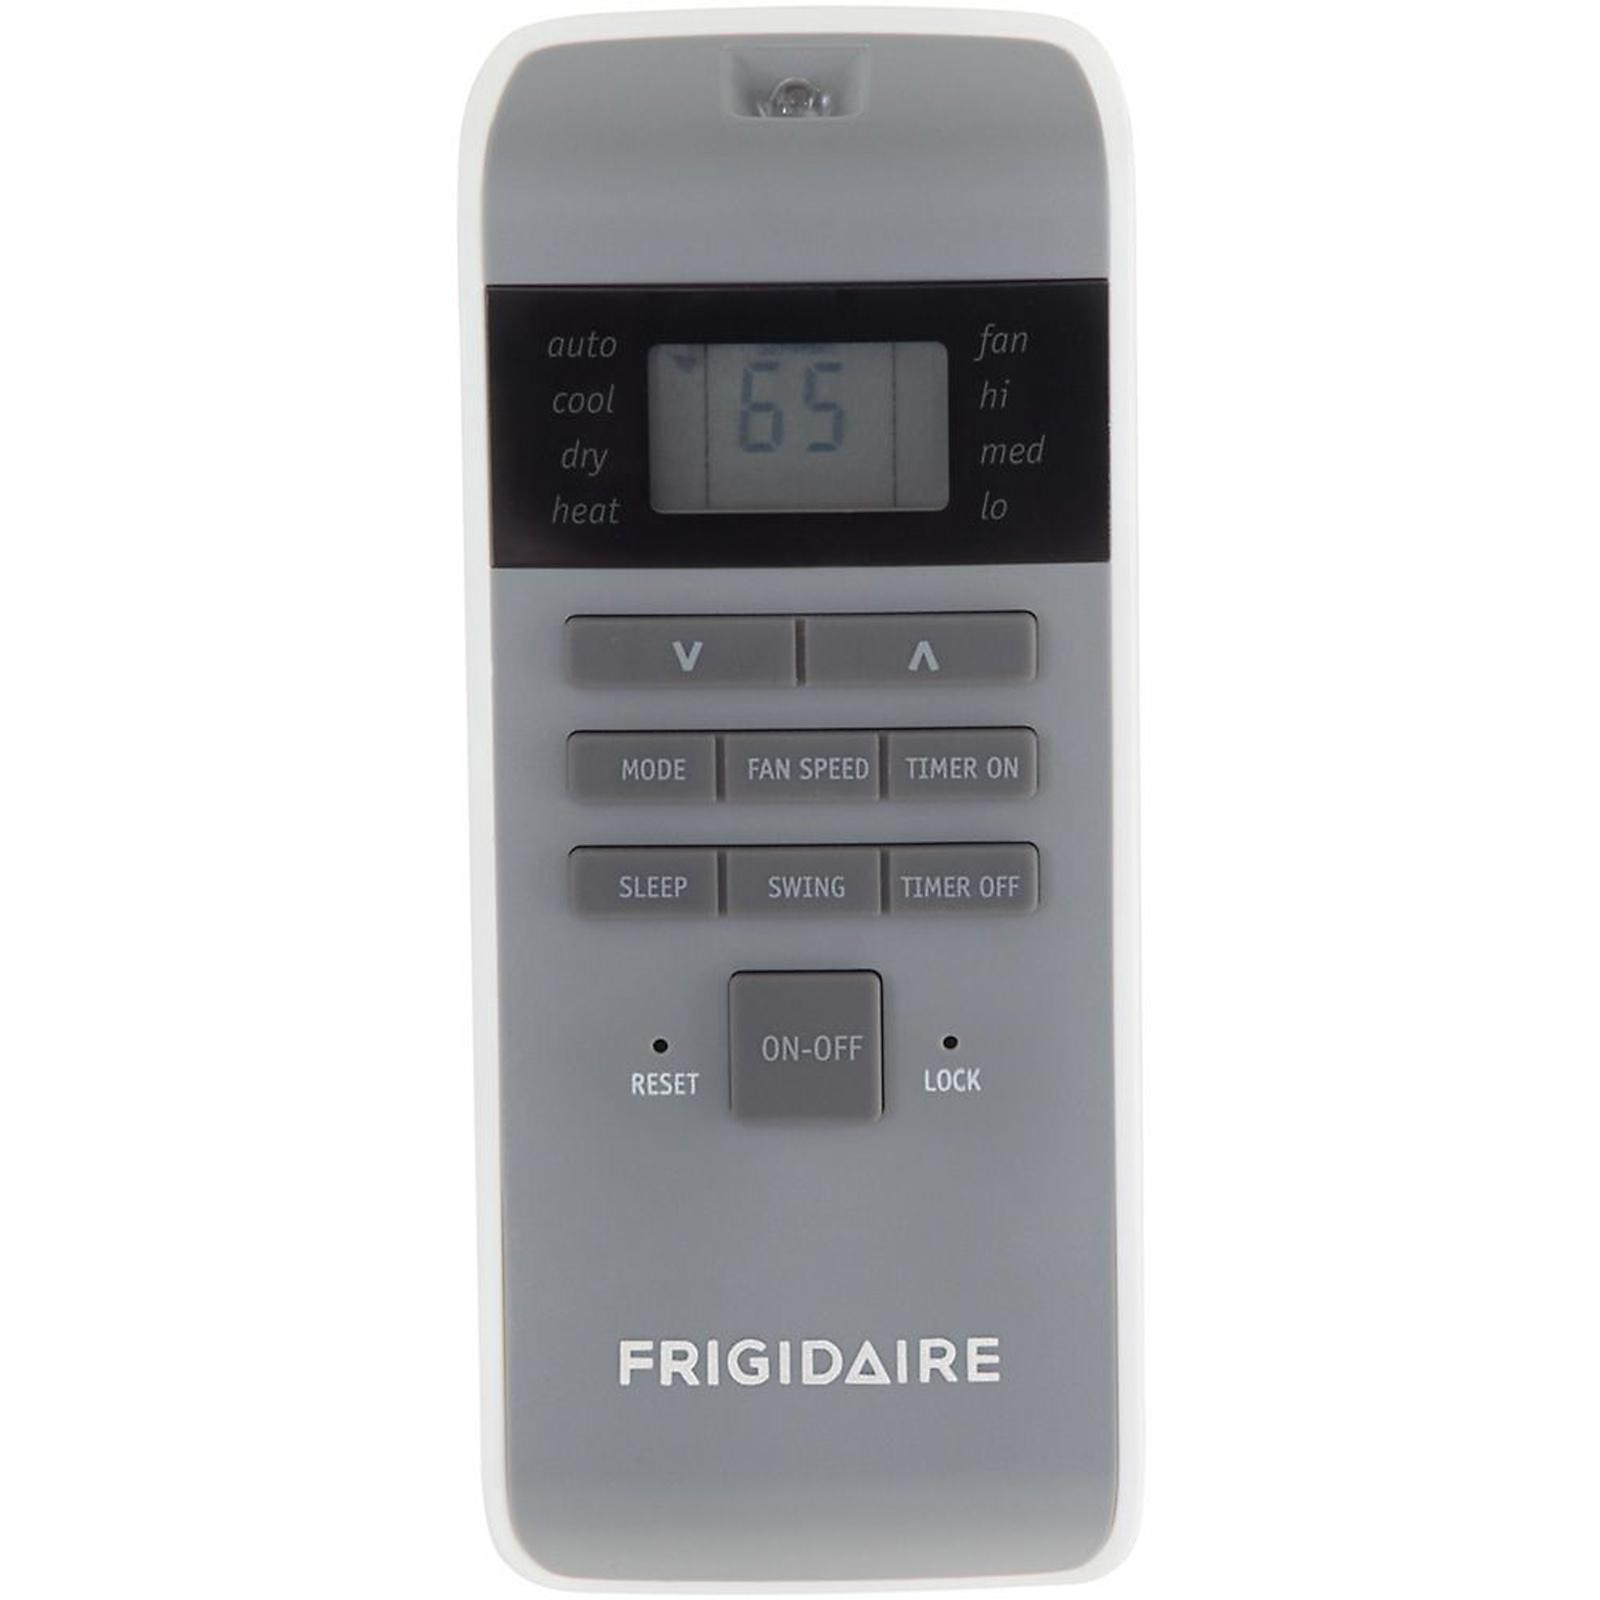 Frigidaire FRA09EPT1 9,000 BTU Cool / 4,100 BTU Heat Portable Air Conditioner with Heat